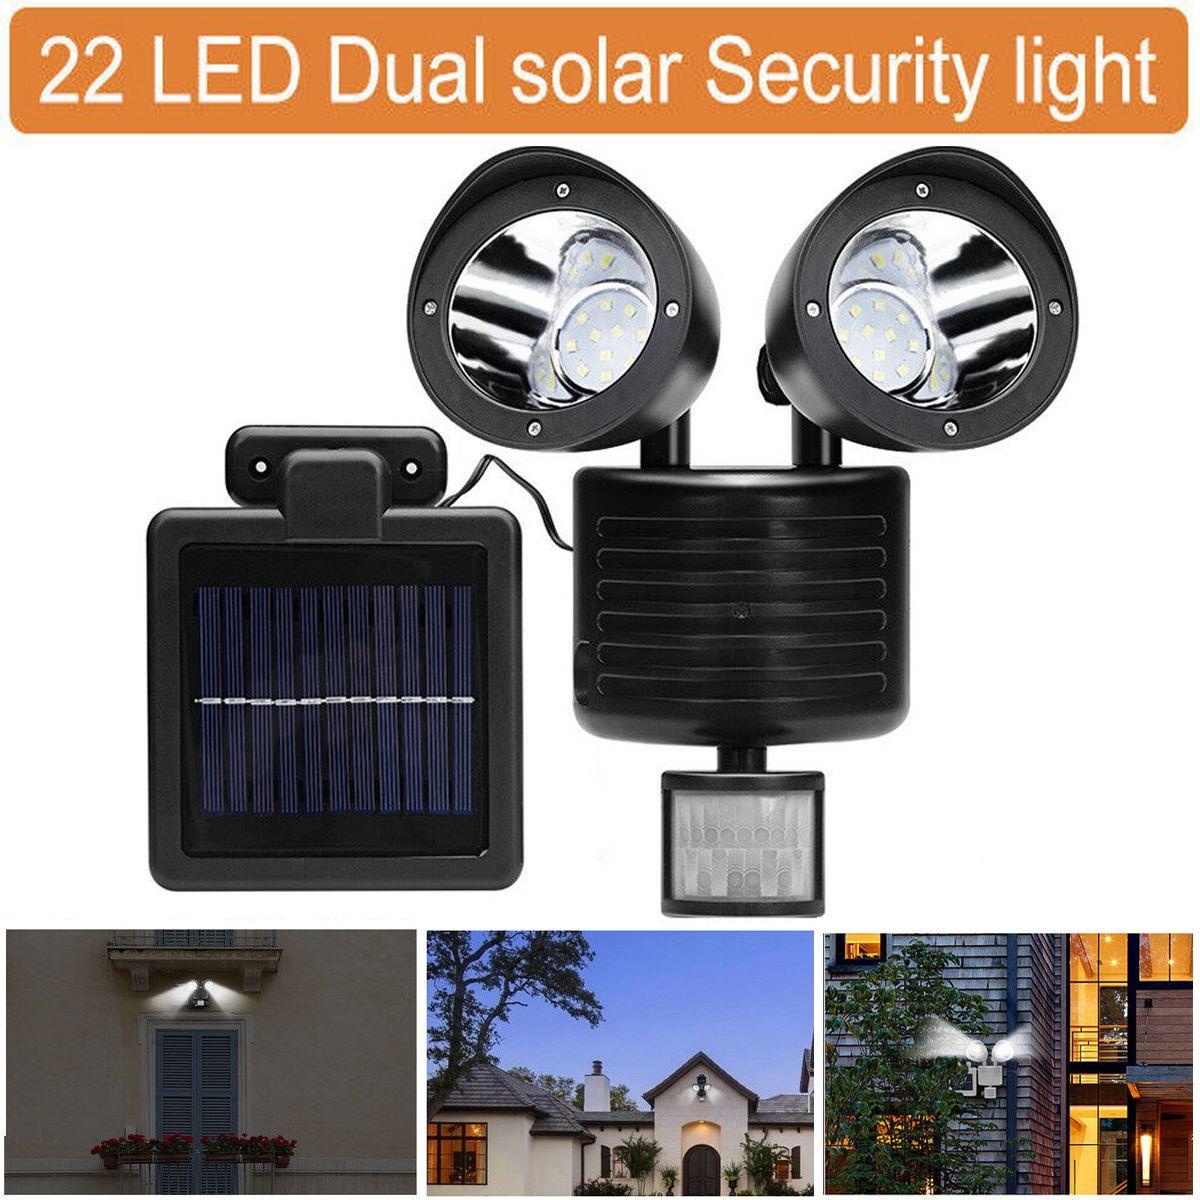 LED Kumho ELBA 15 W Auto Sensor Motion Detector Light Down Light Lamp Daylight